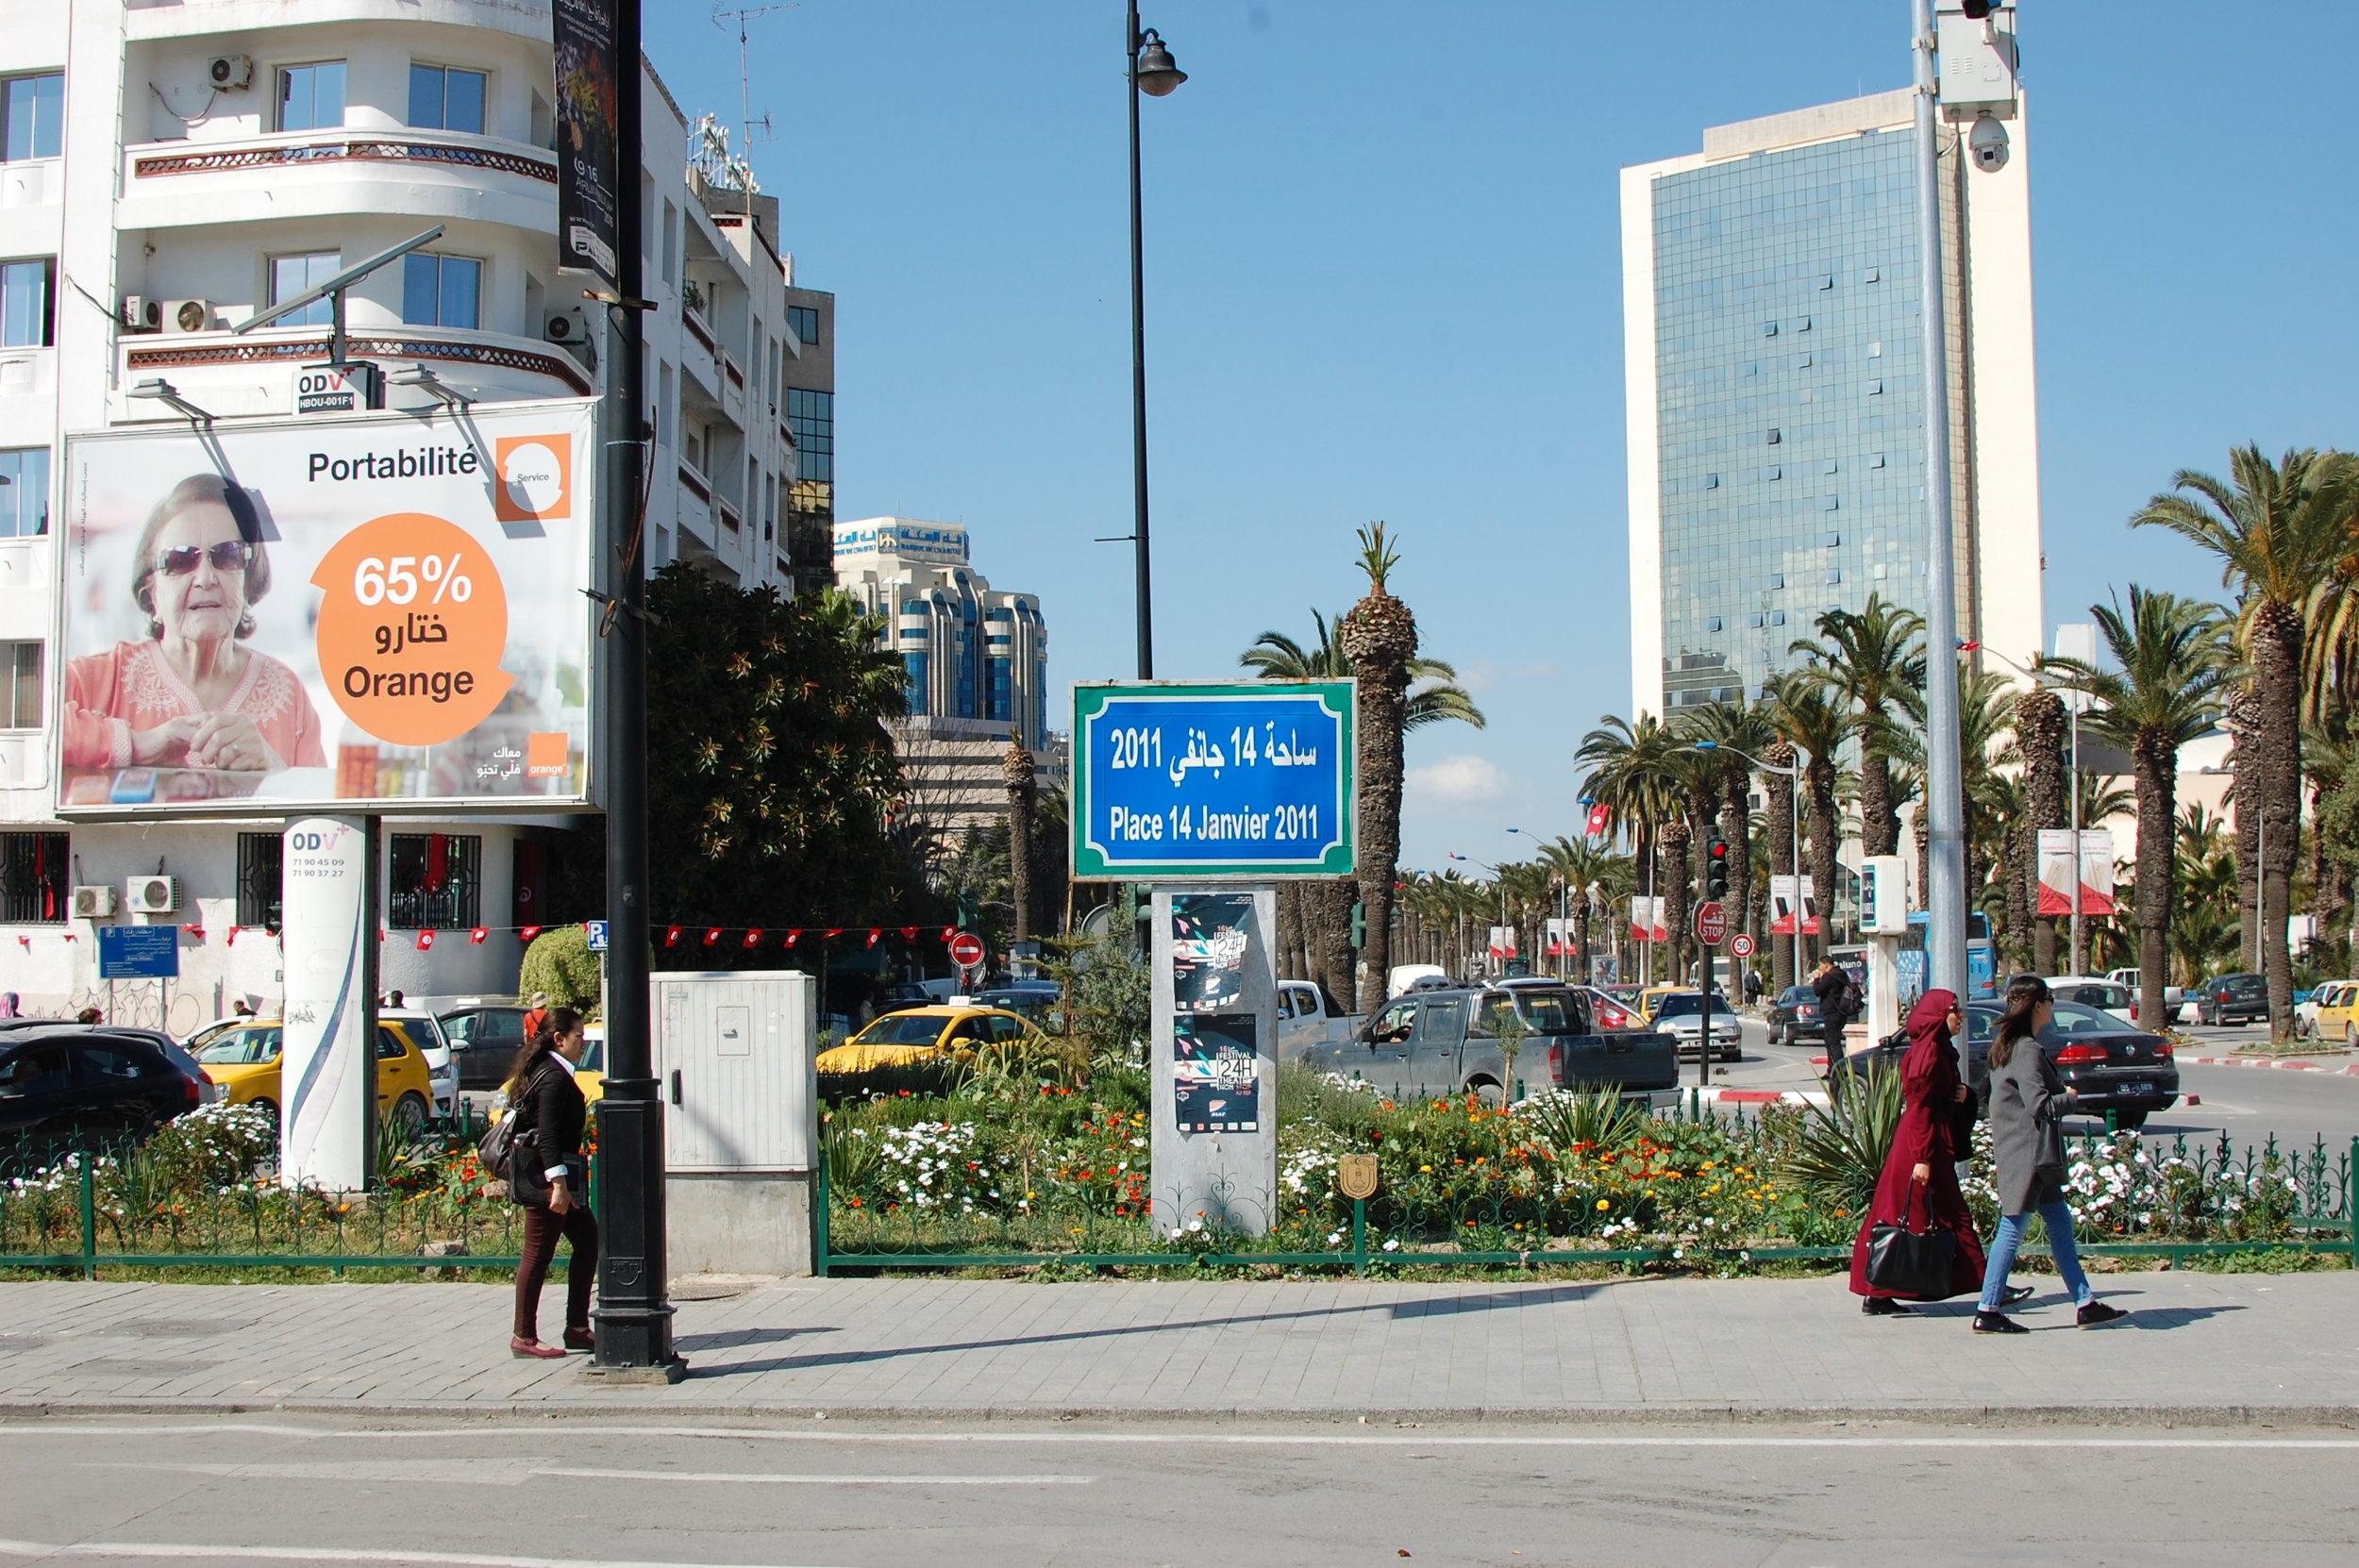 Photograph provided by Mariem Chalouati, MEII Tunisia Staff.